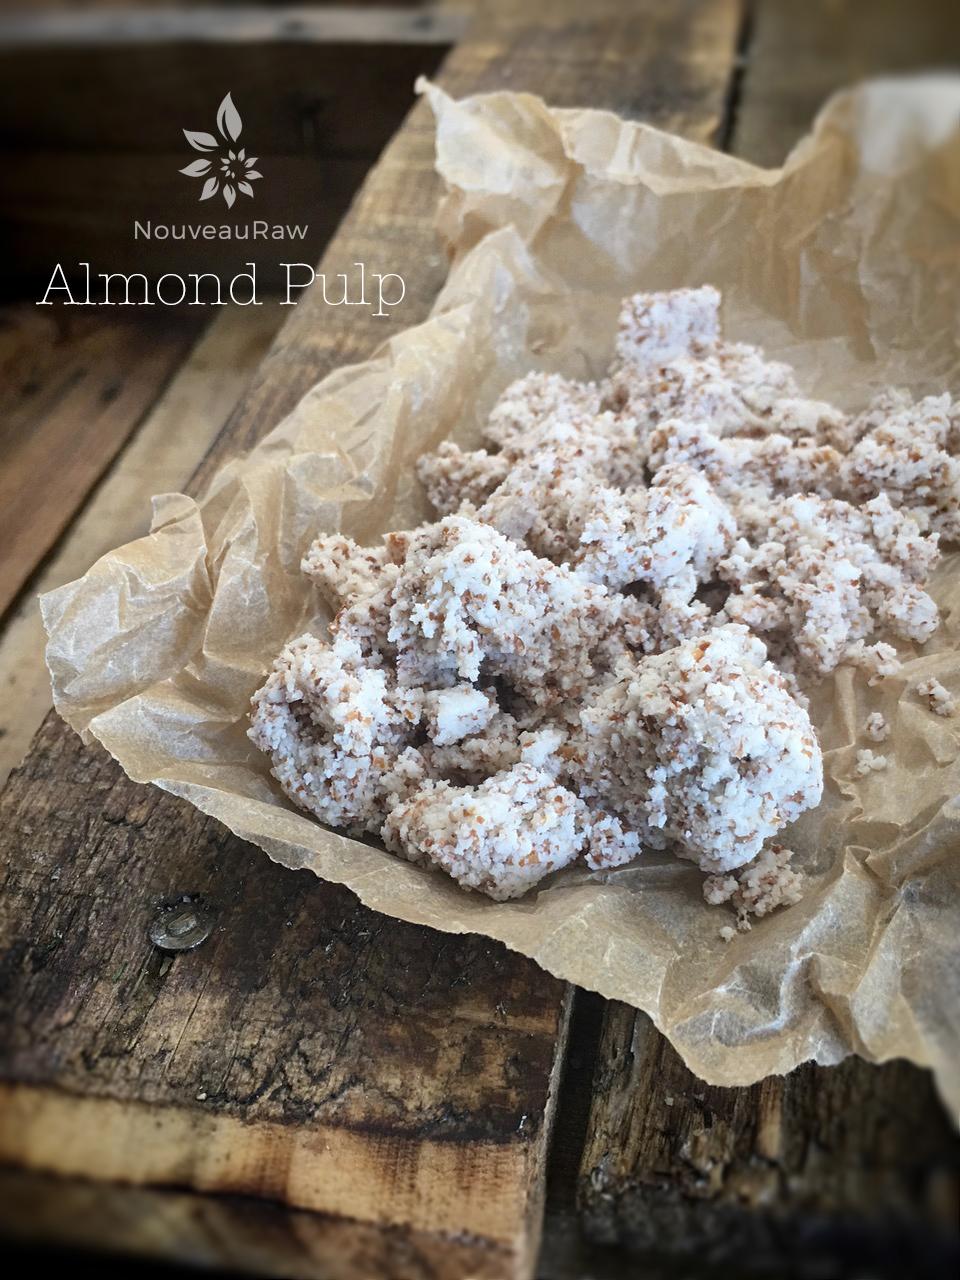 almond-pulp-featured